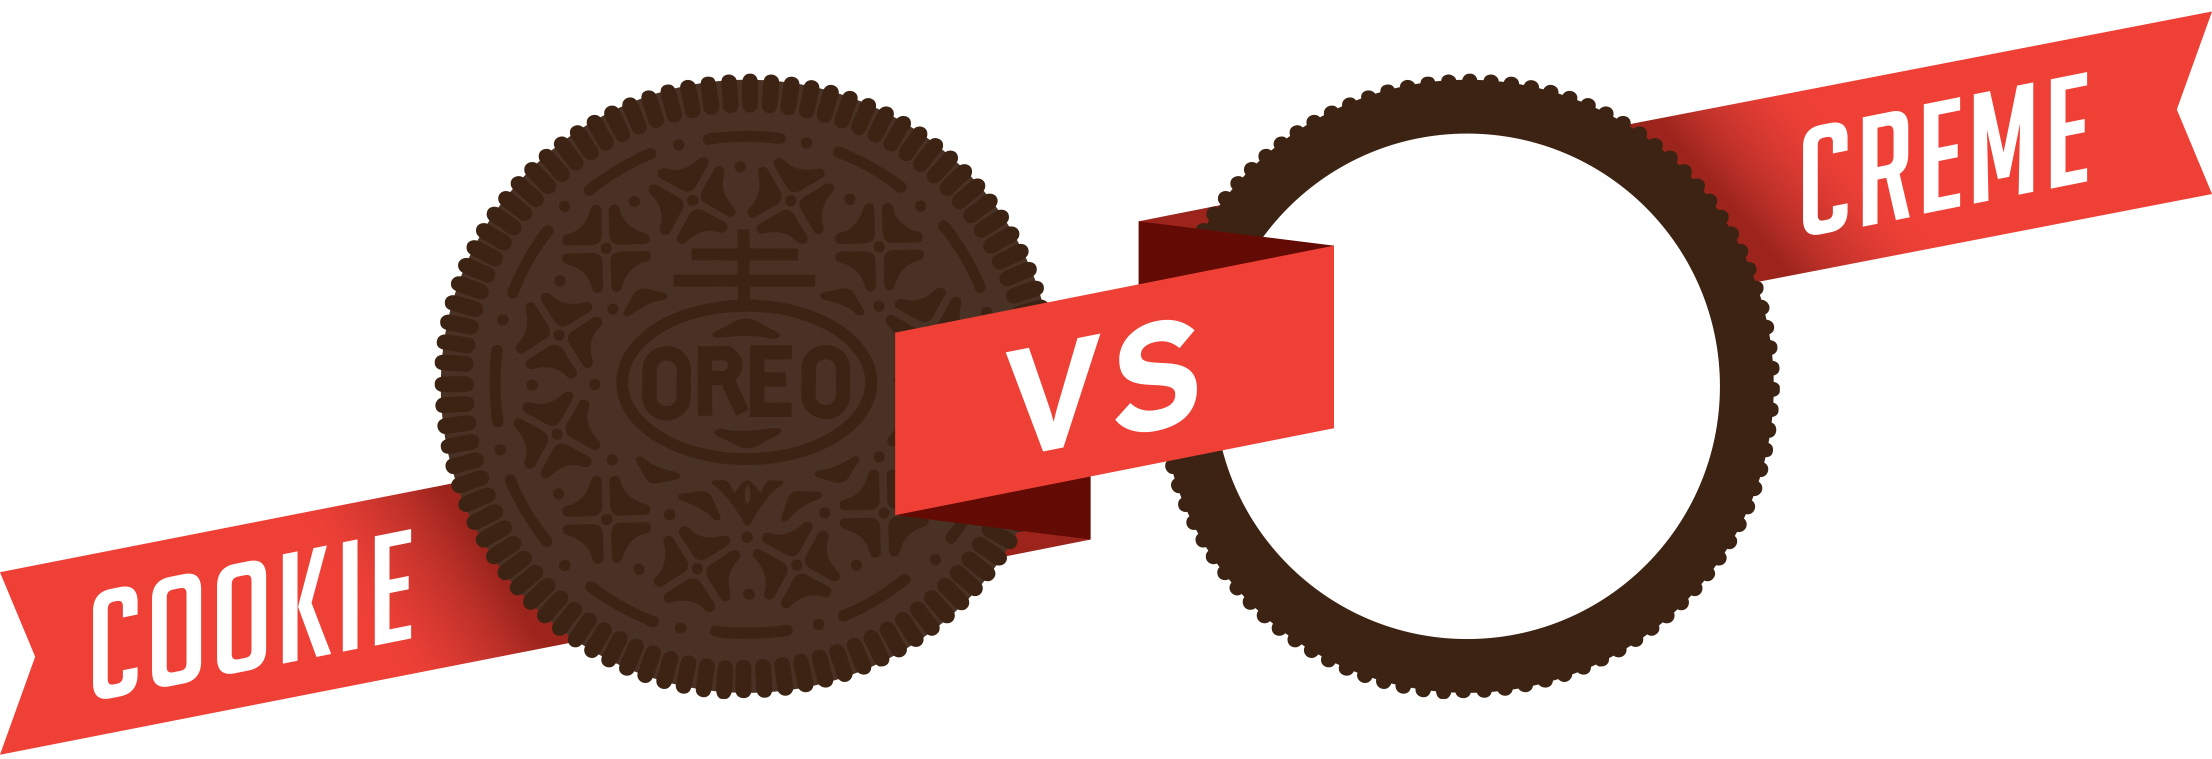 2212x759 Oreo Cookie Vs. Cream Separator